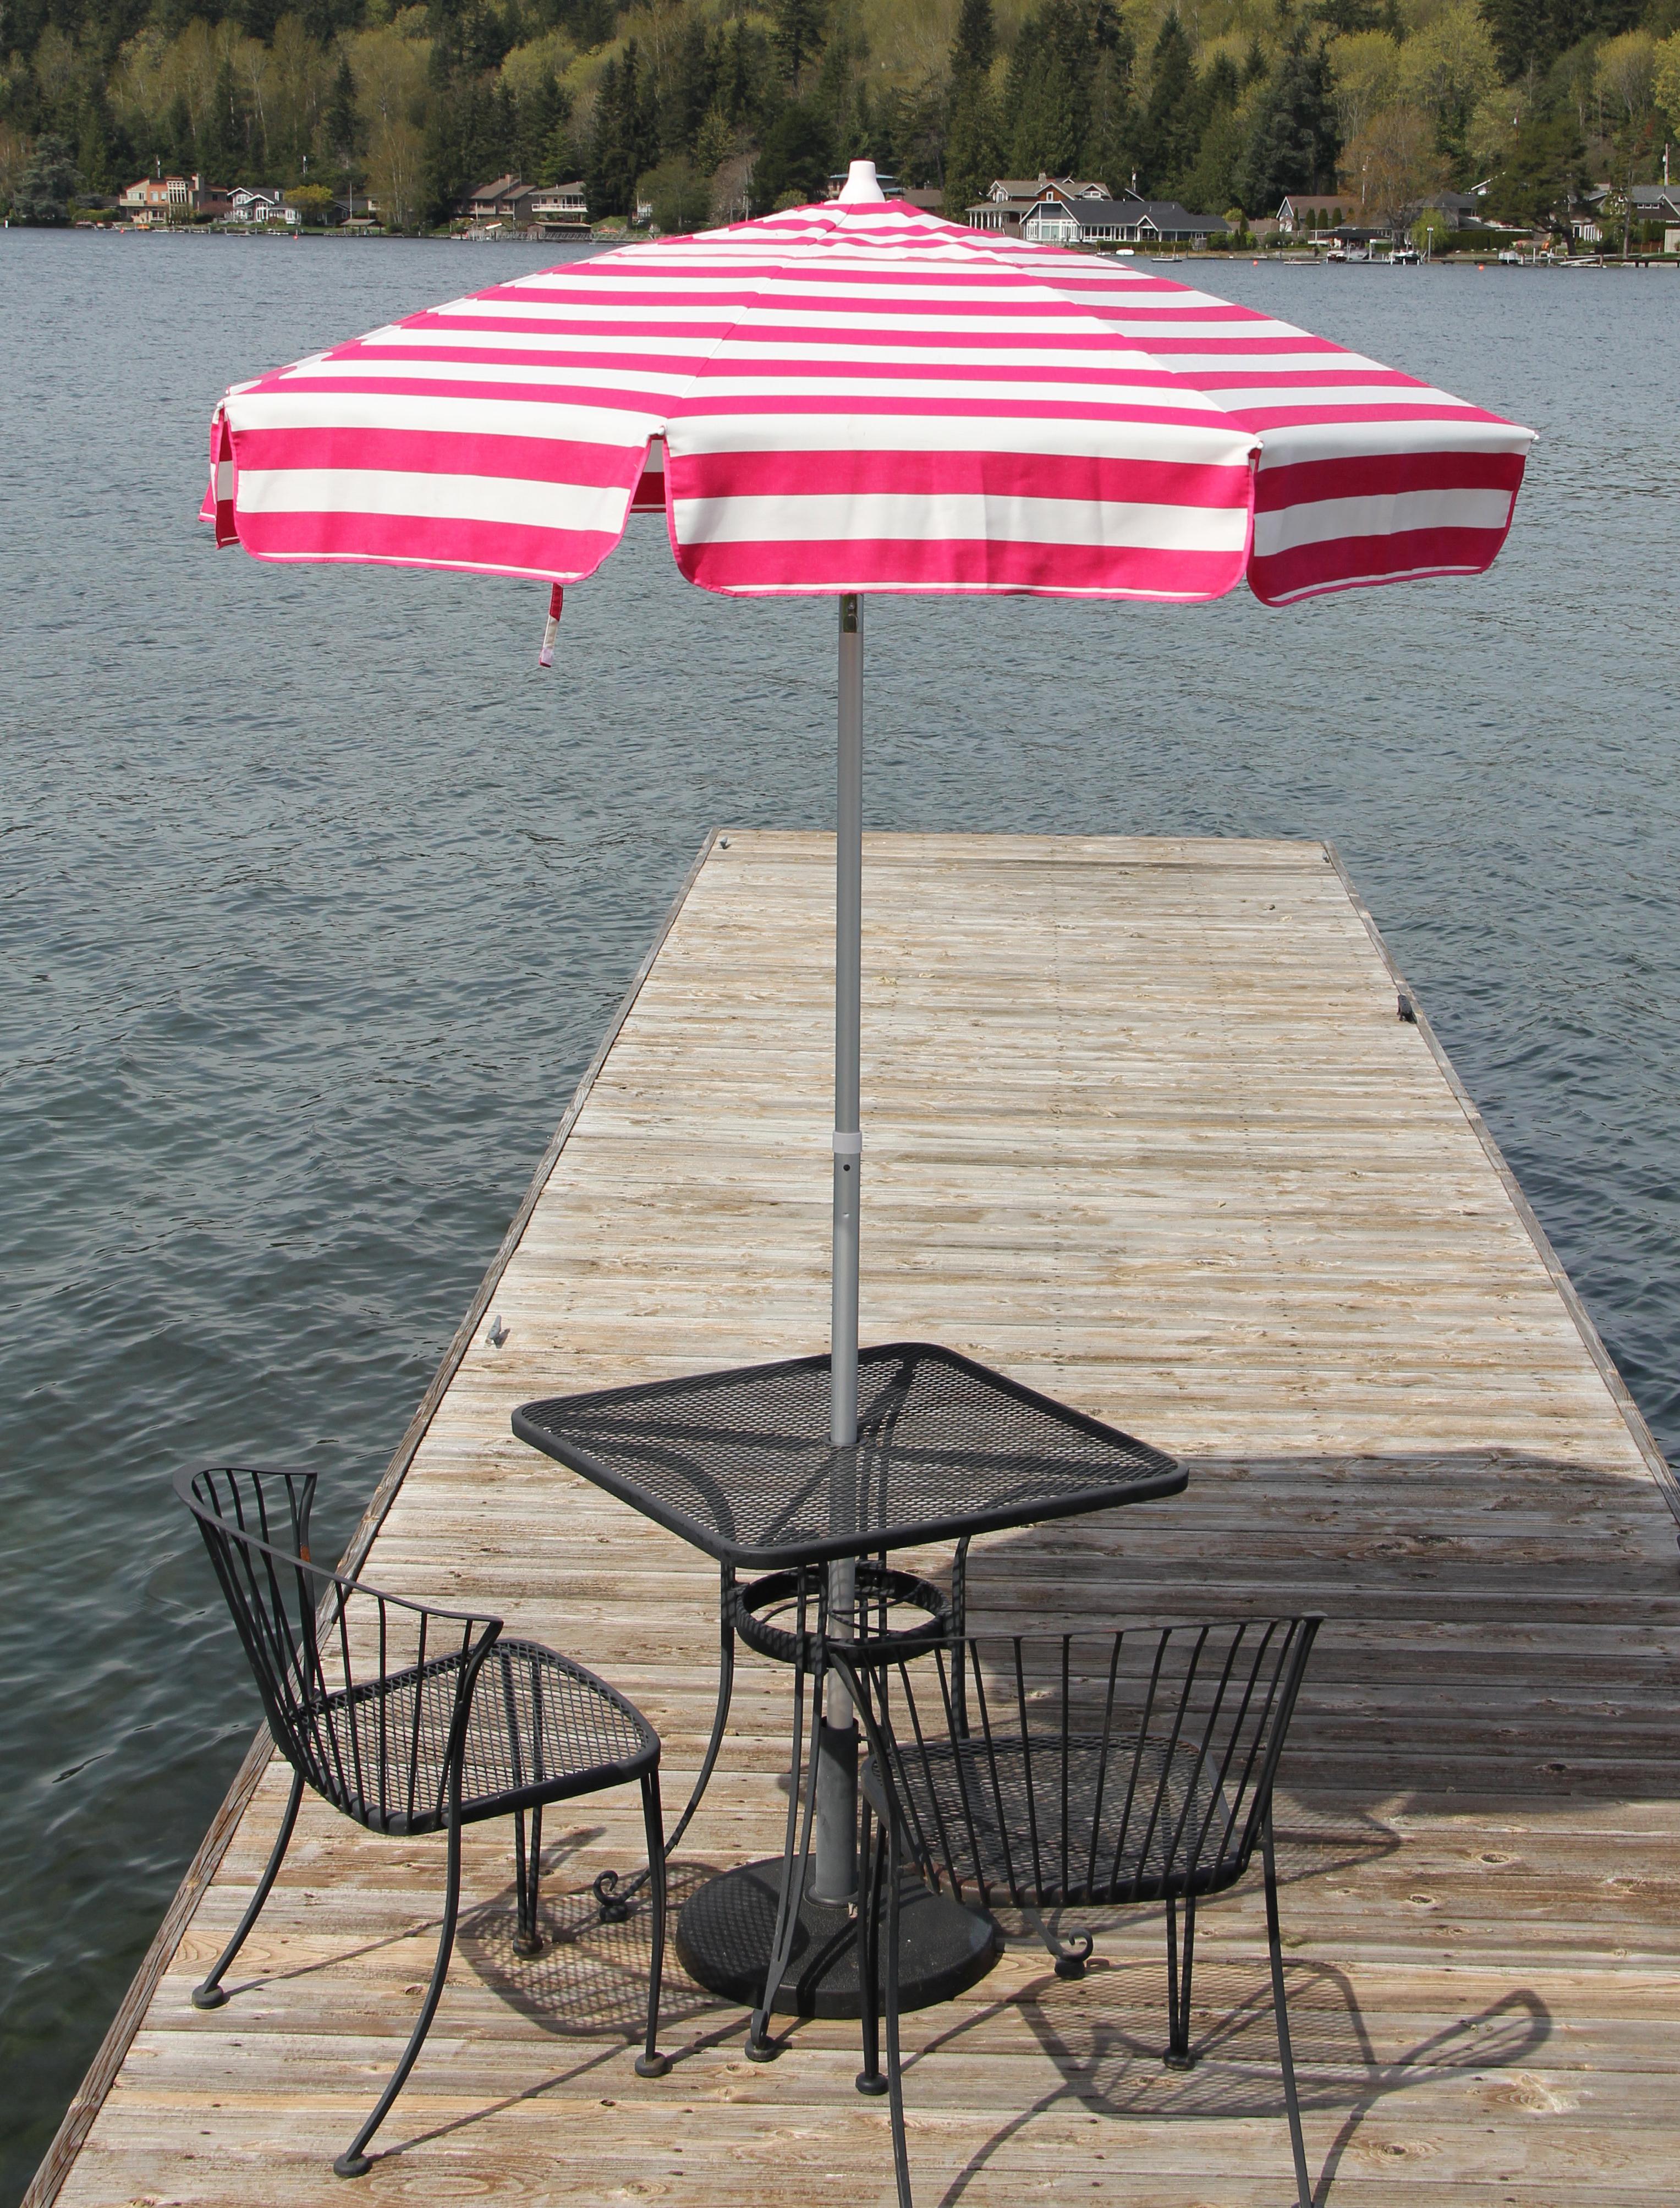 Pedrick Drape Market Umbrellas For Well Known Italian 6' Market Umbrella (View 13 of 20)